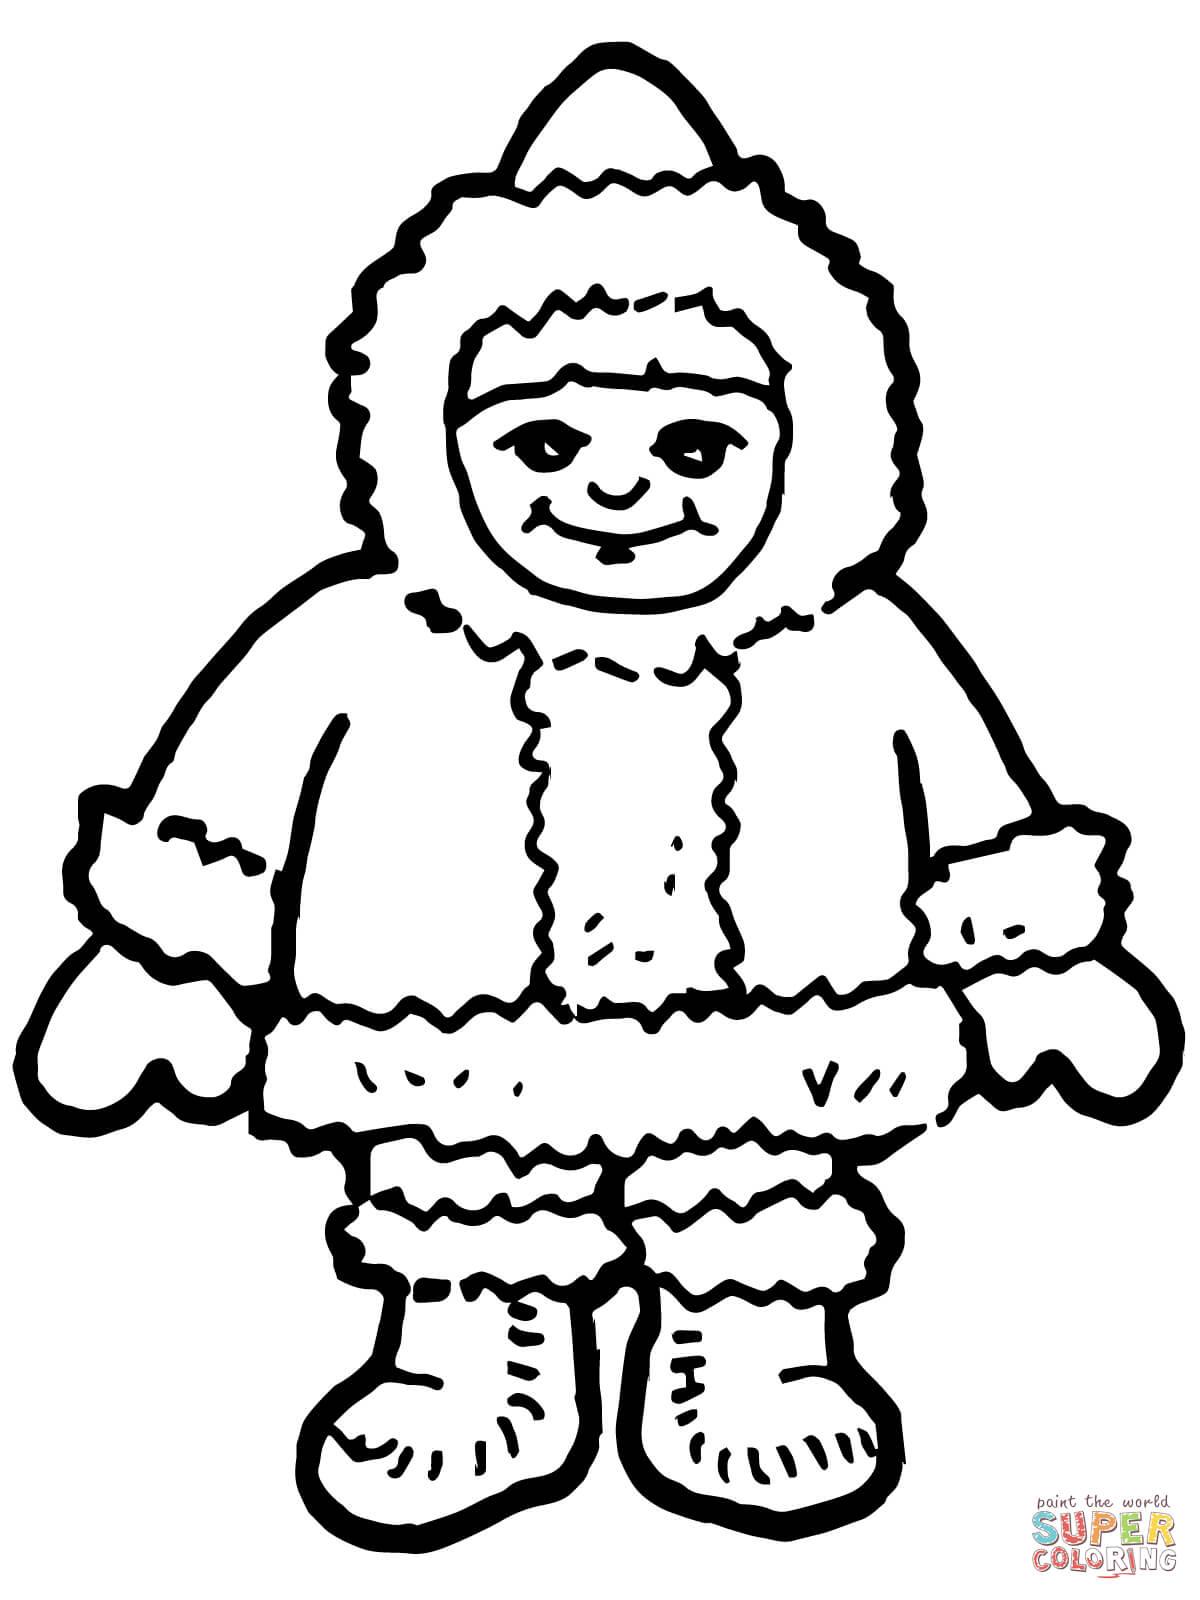 Eskimo Coloring Page Template